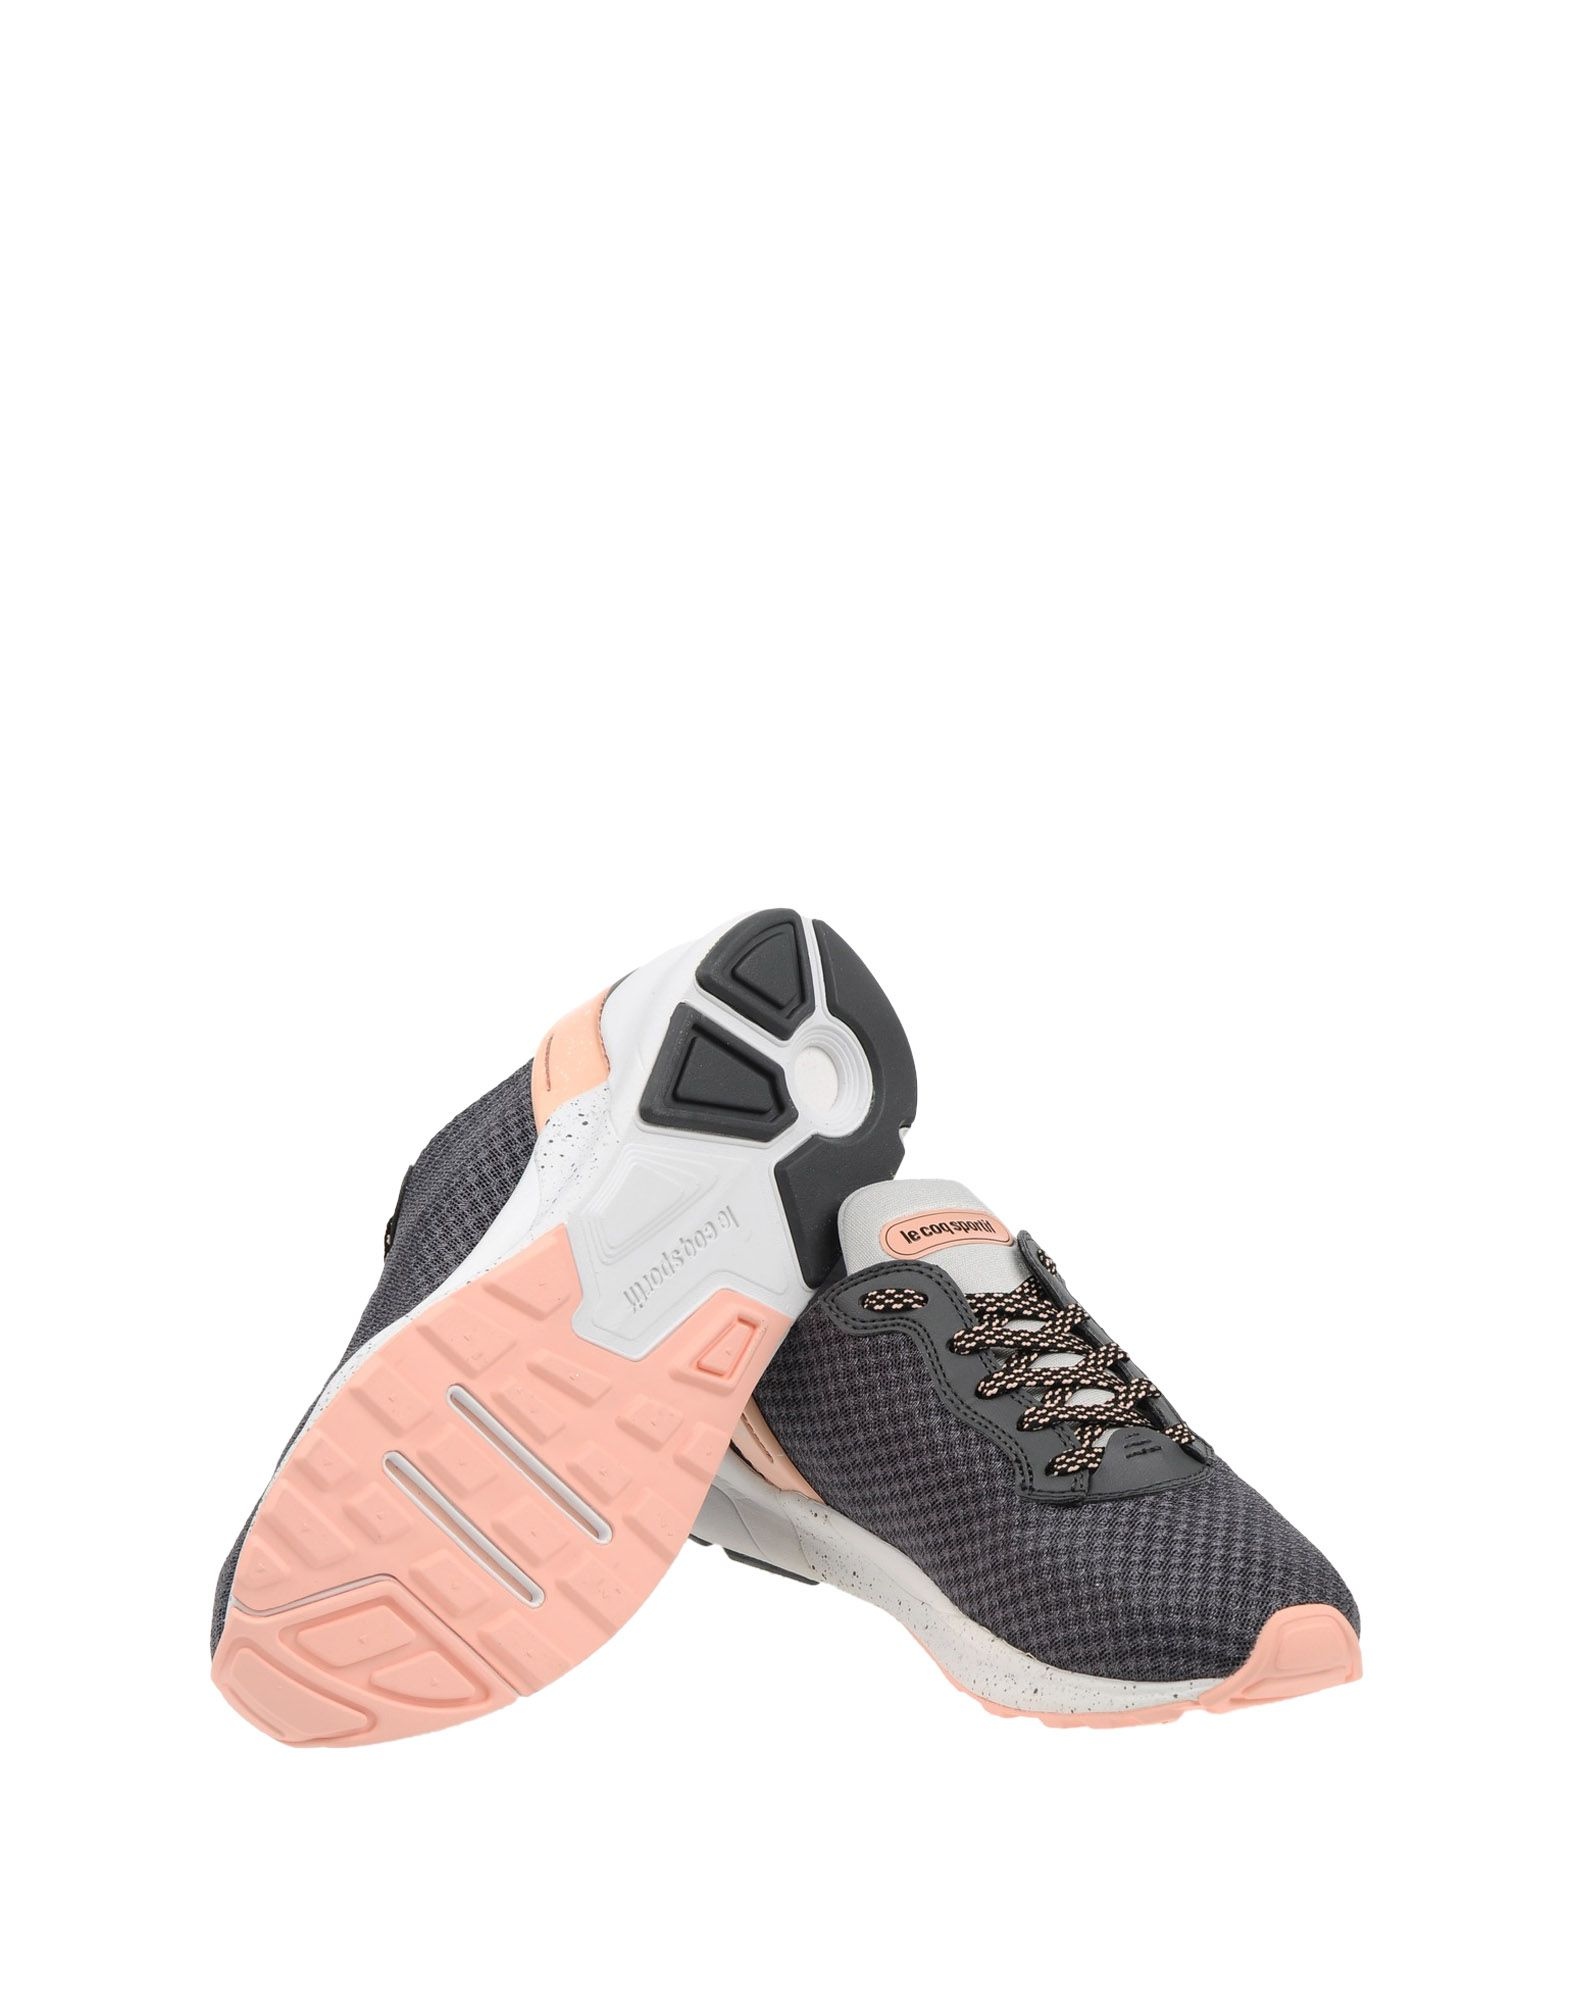 Sneakers Le Coq Sportif Running - Femme - Sneakers Le Coq Sportif sur